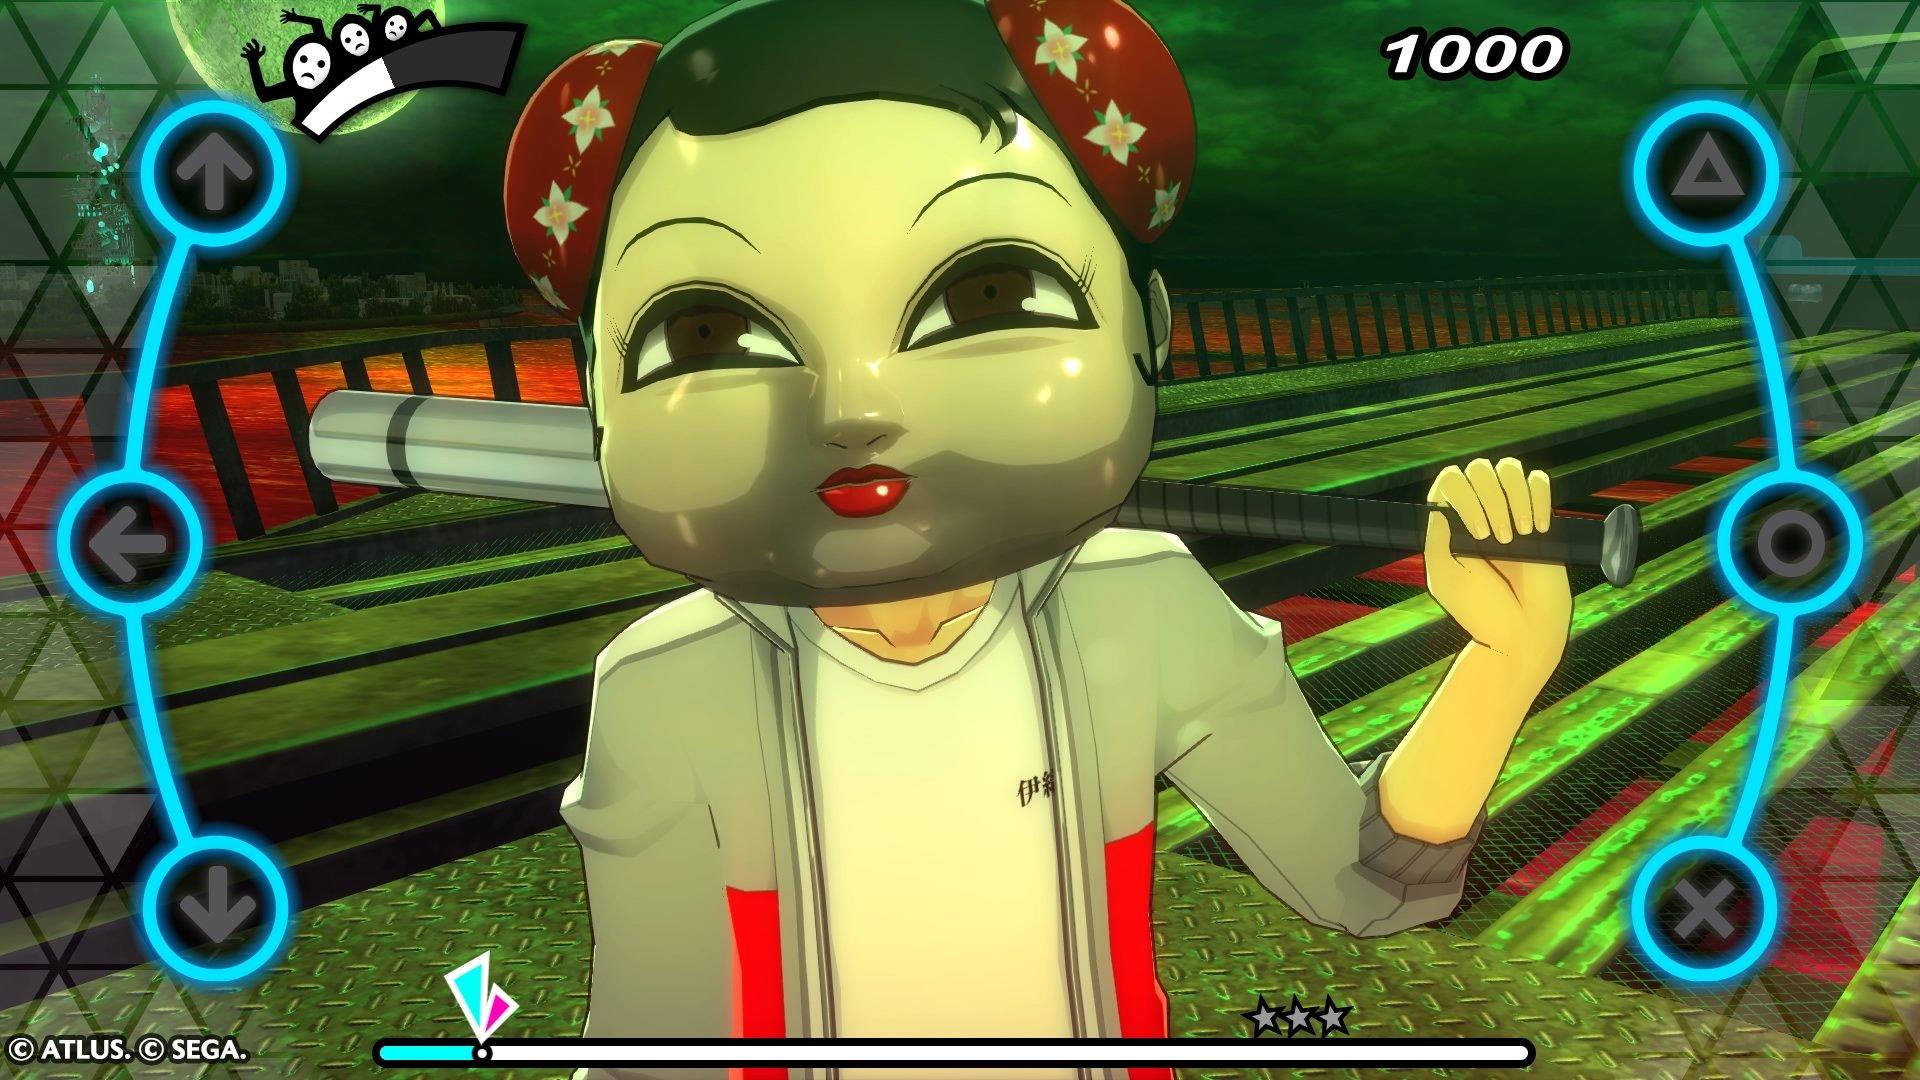 Persona 3: Dancing in Moonlight review